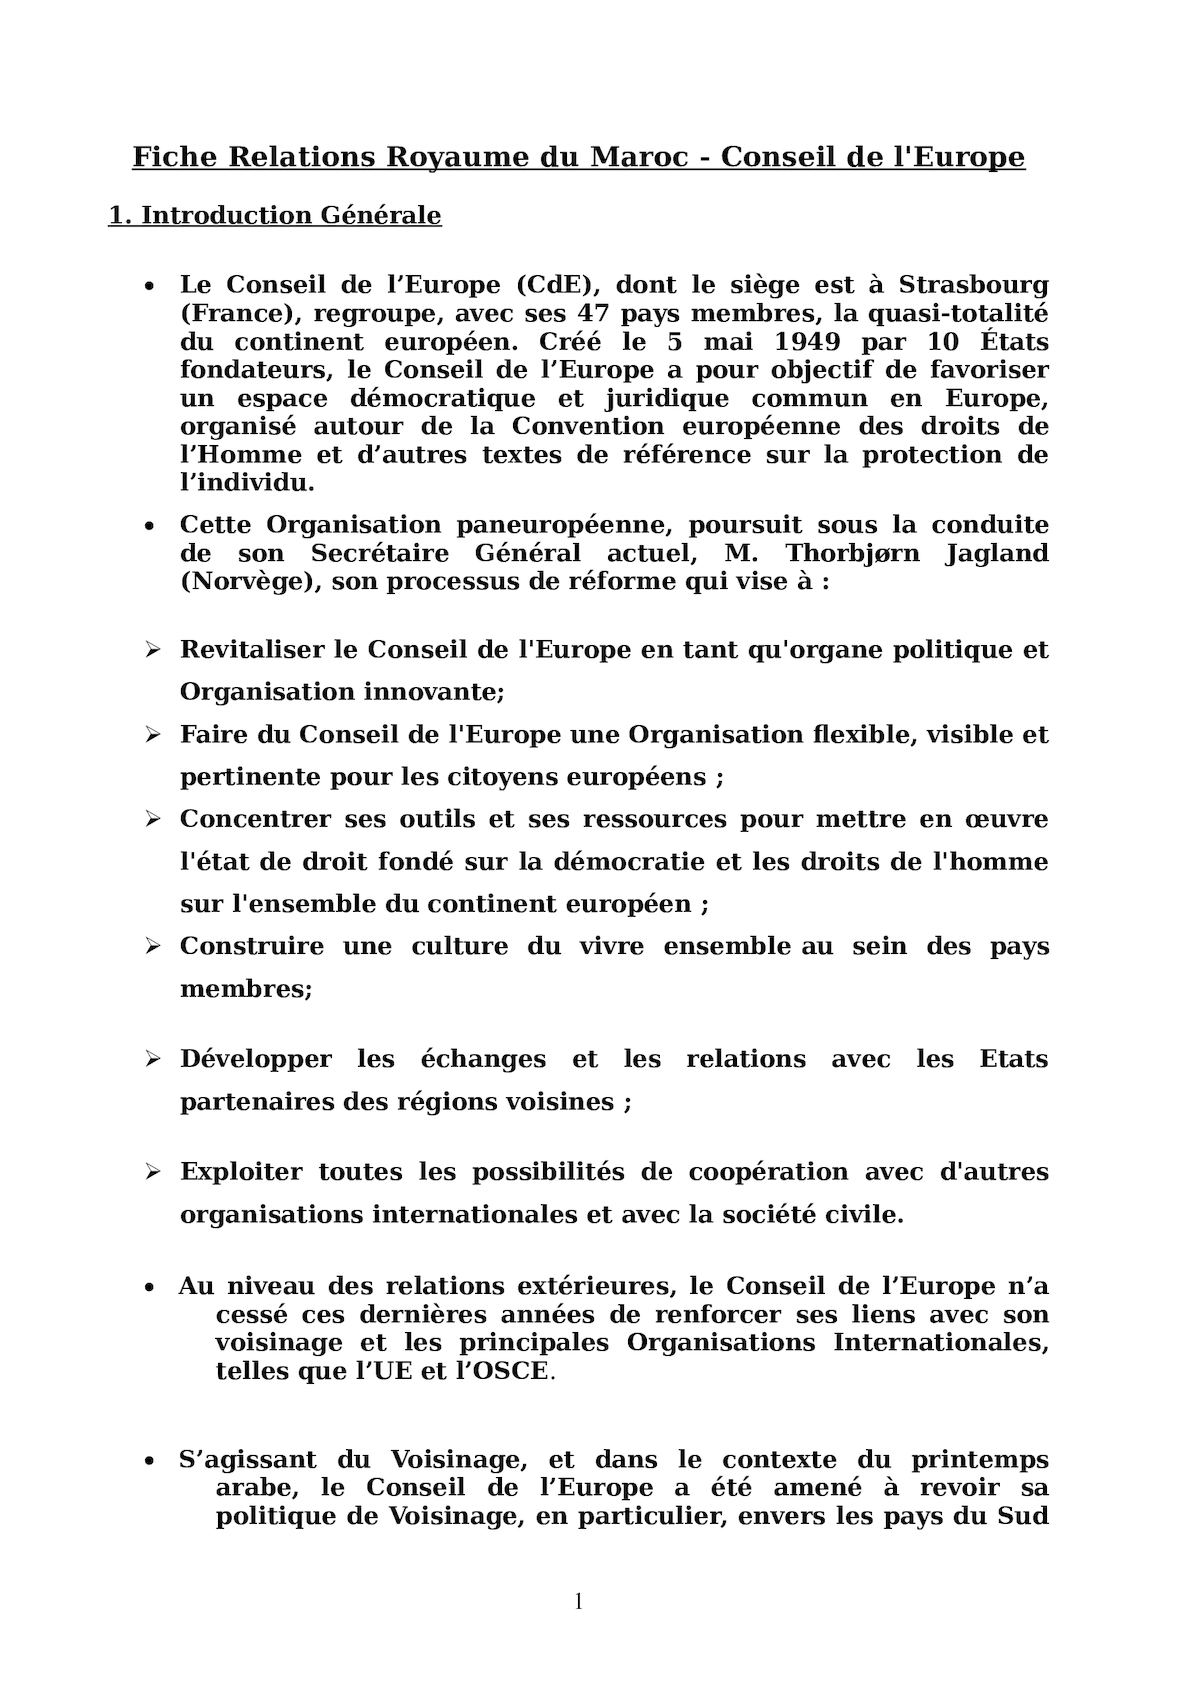 Fiche 1 Relations Maroc Conseil De L'europe